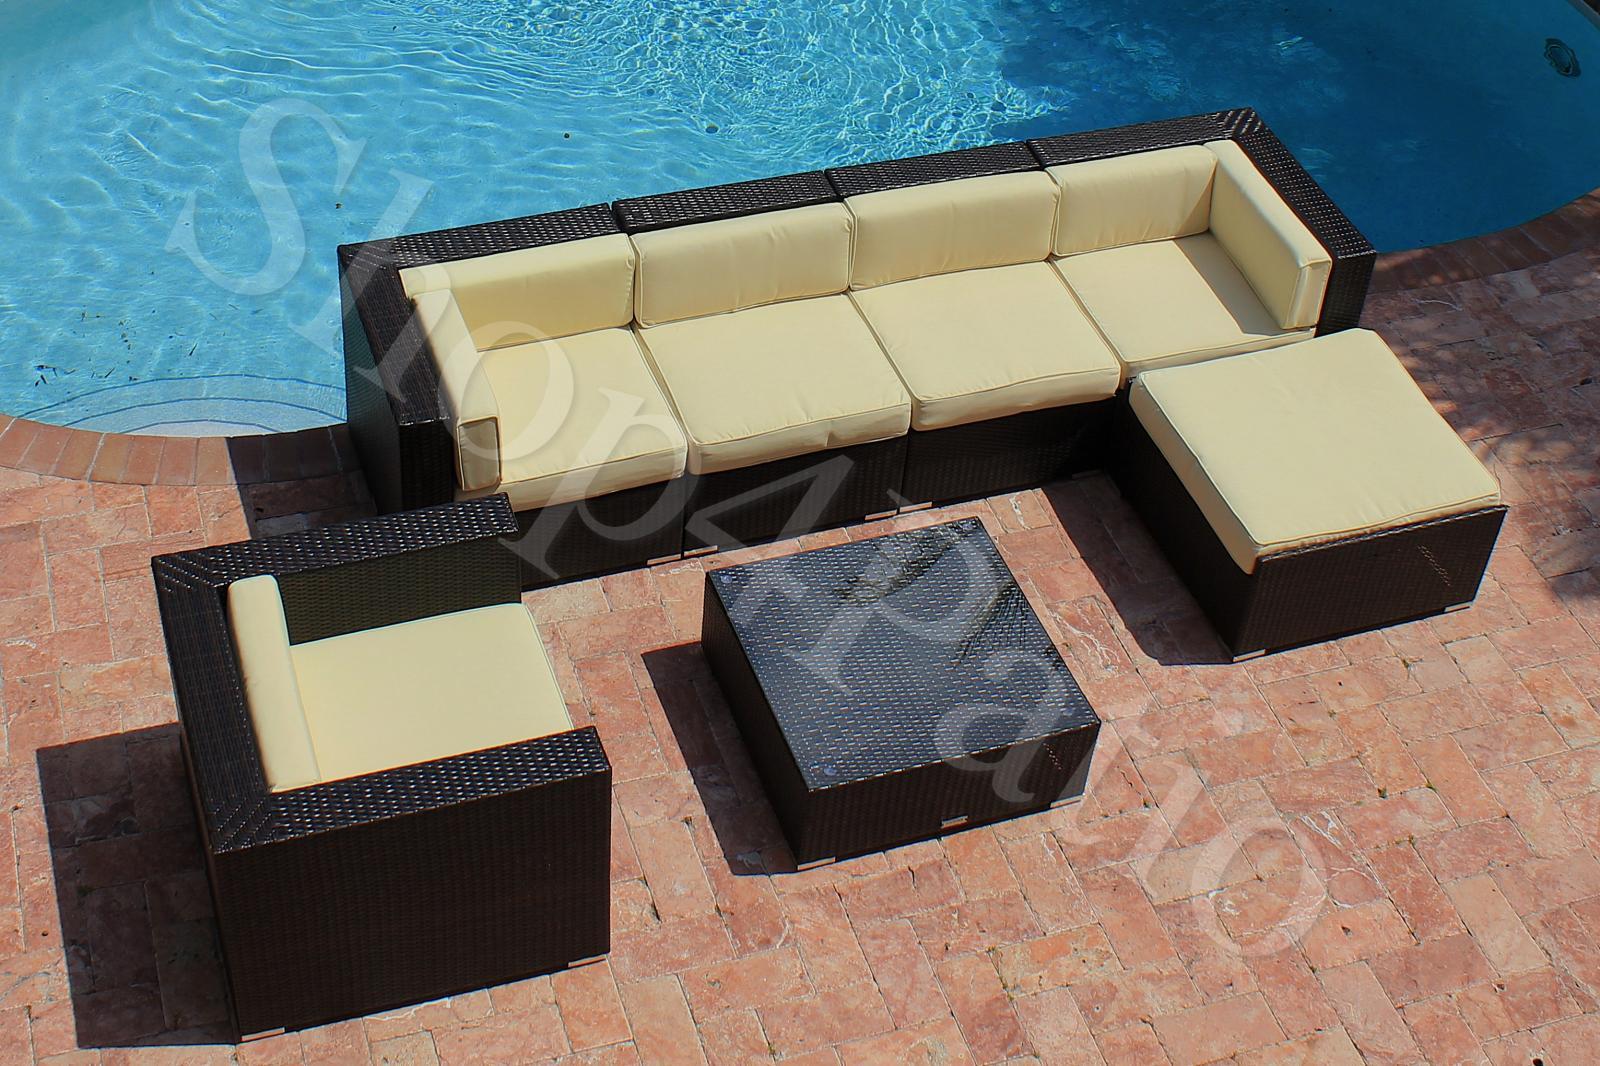 7 Piece Patio Furniture Modern Garden Wicker Modular Sofa